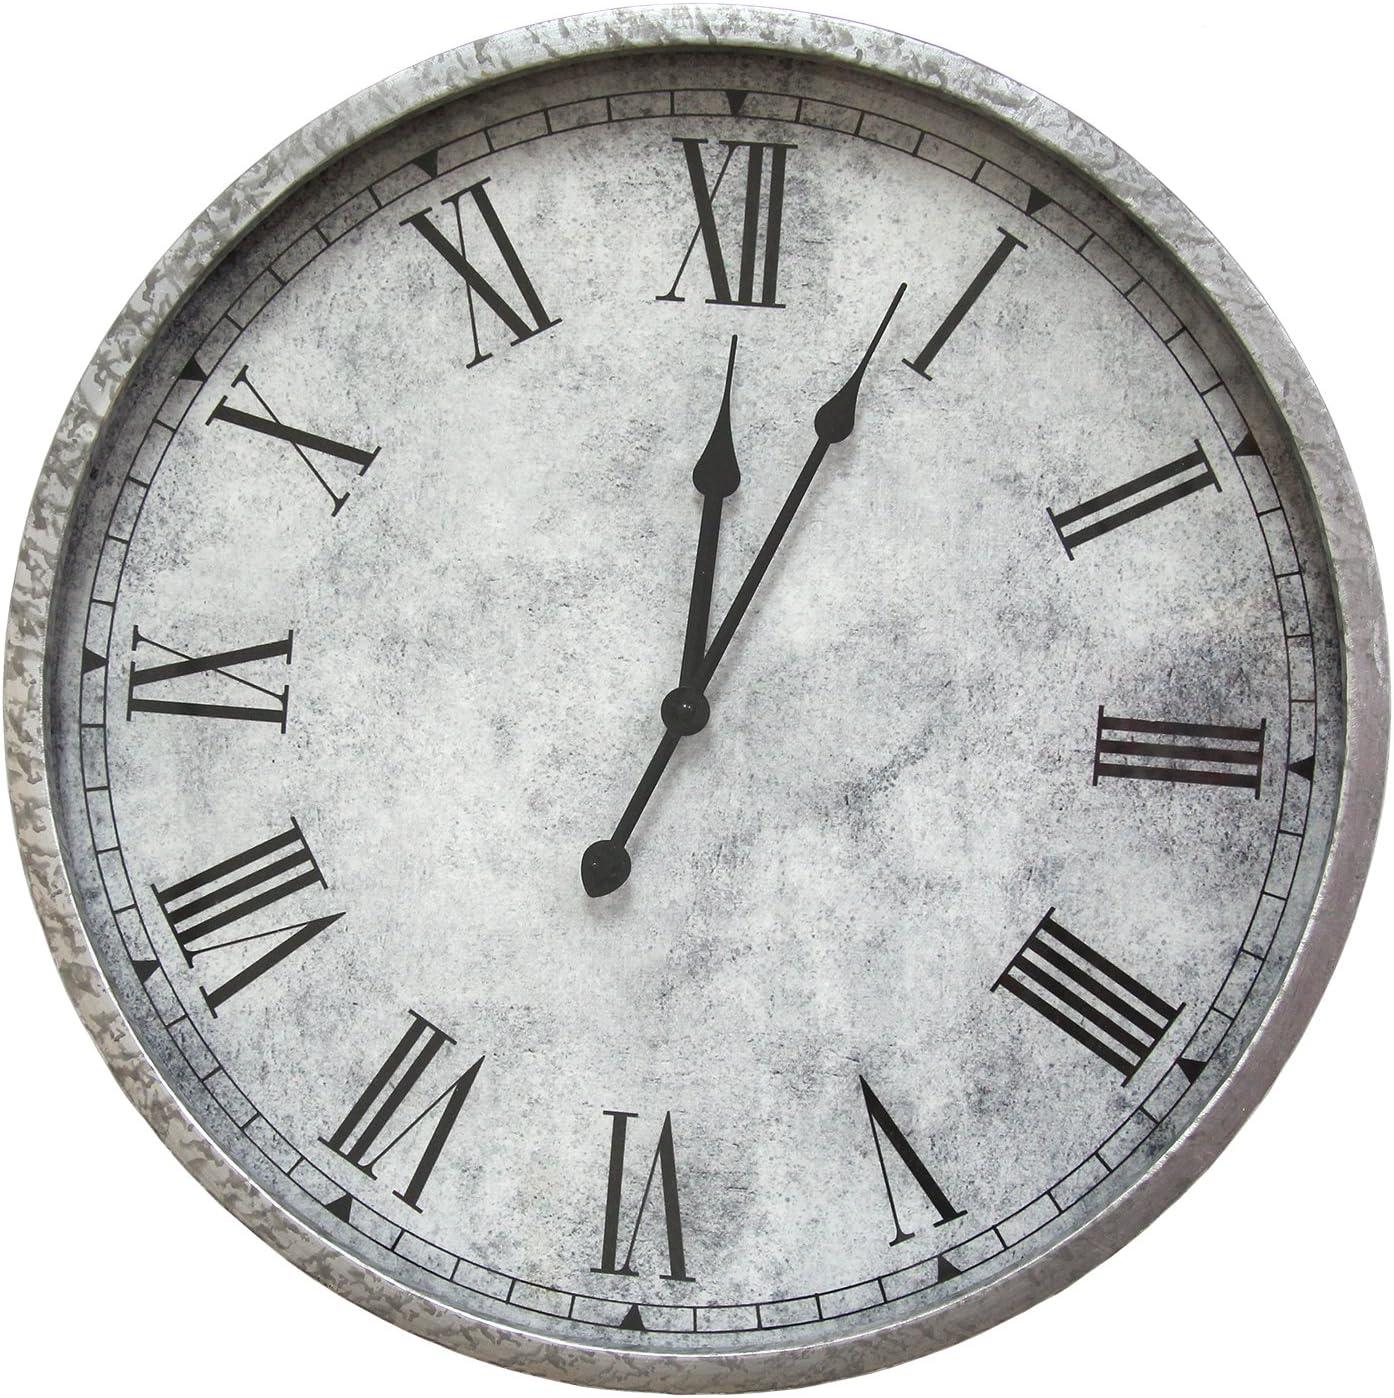 Stratton Home Decor S07721 Direct sale of manufacturer Gaston depot Wall Clock W 18.00 D 2.50 x